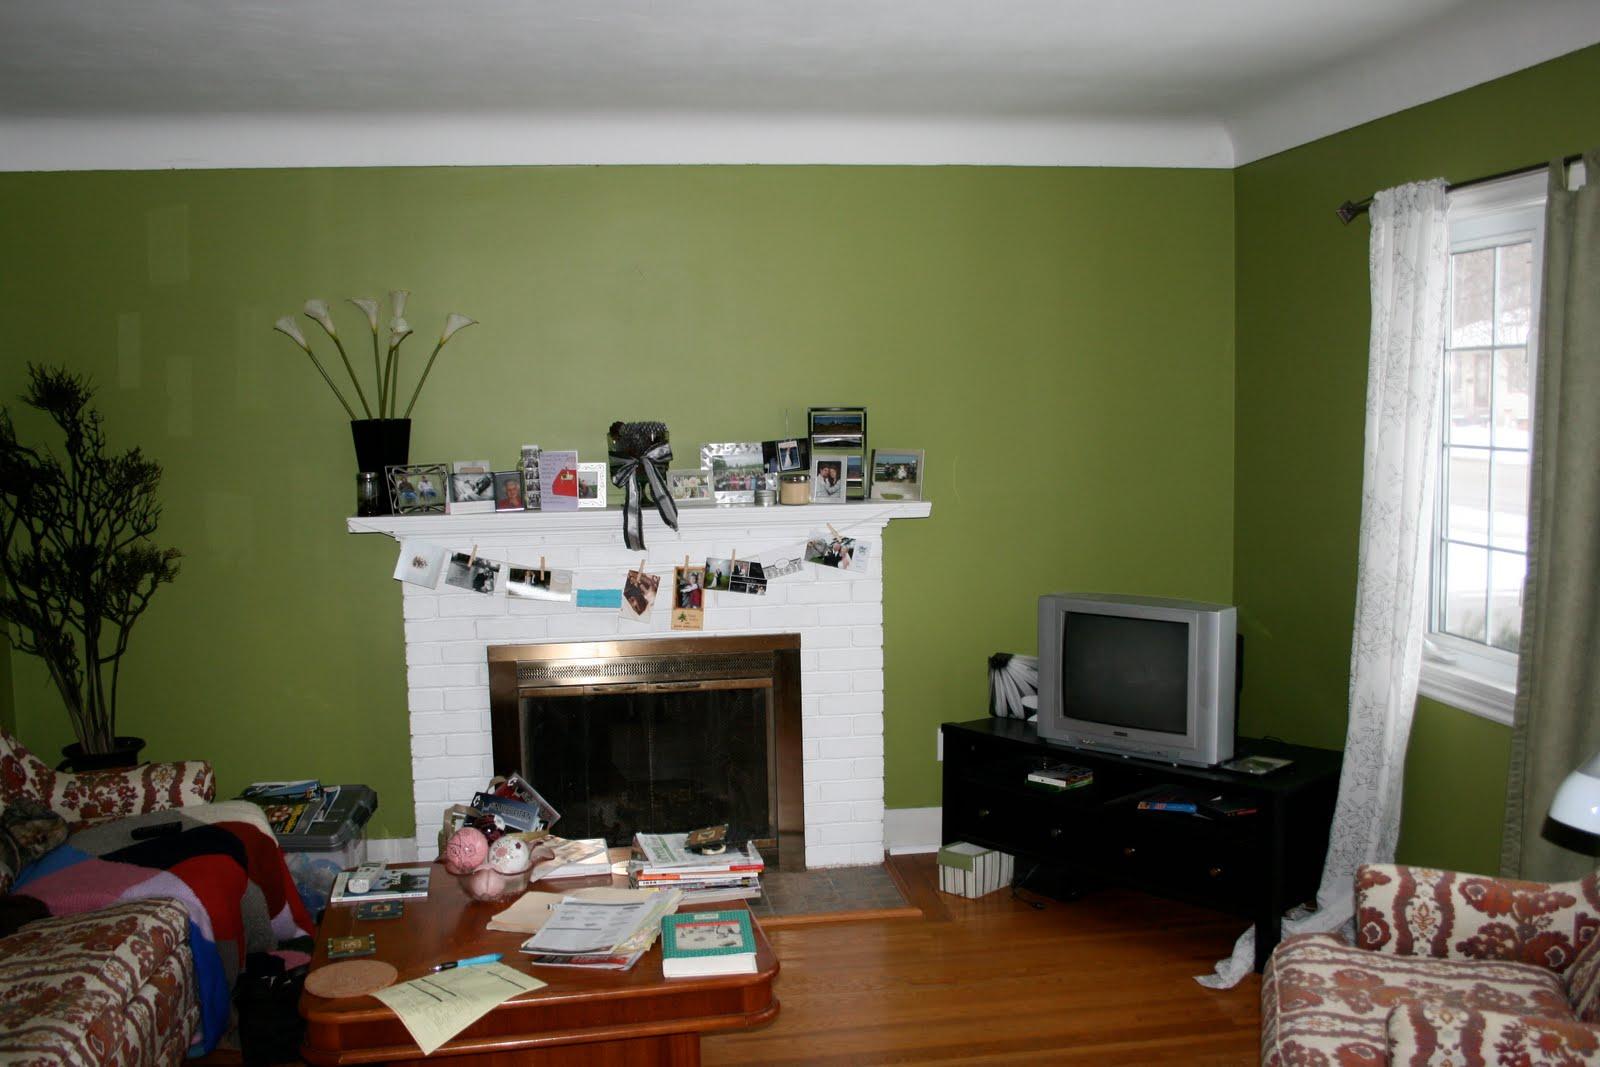 Http Savvyhomegirl Blogspot Com 2010 03 Living Room Redo Featuring My Free Html